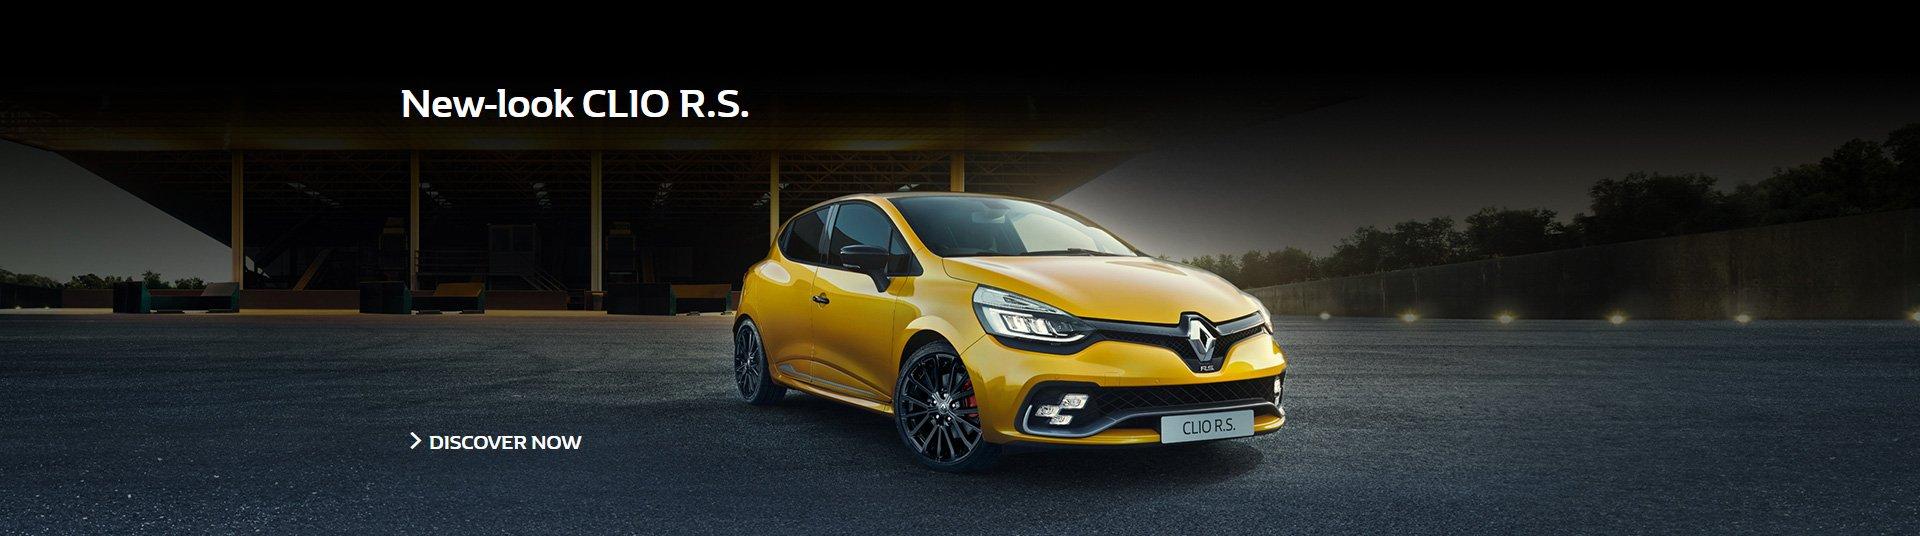 New-look CLIO R.S.